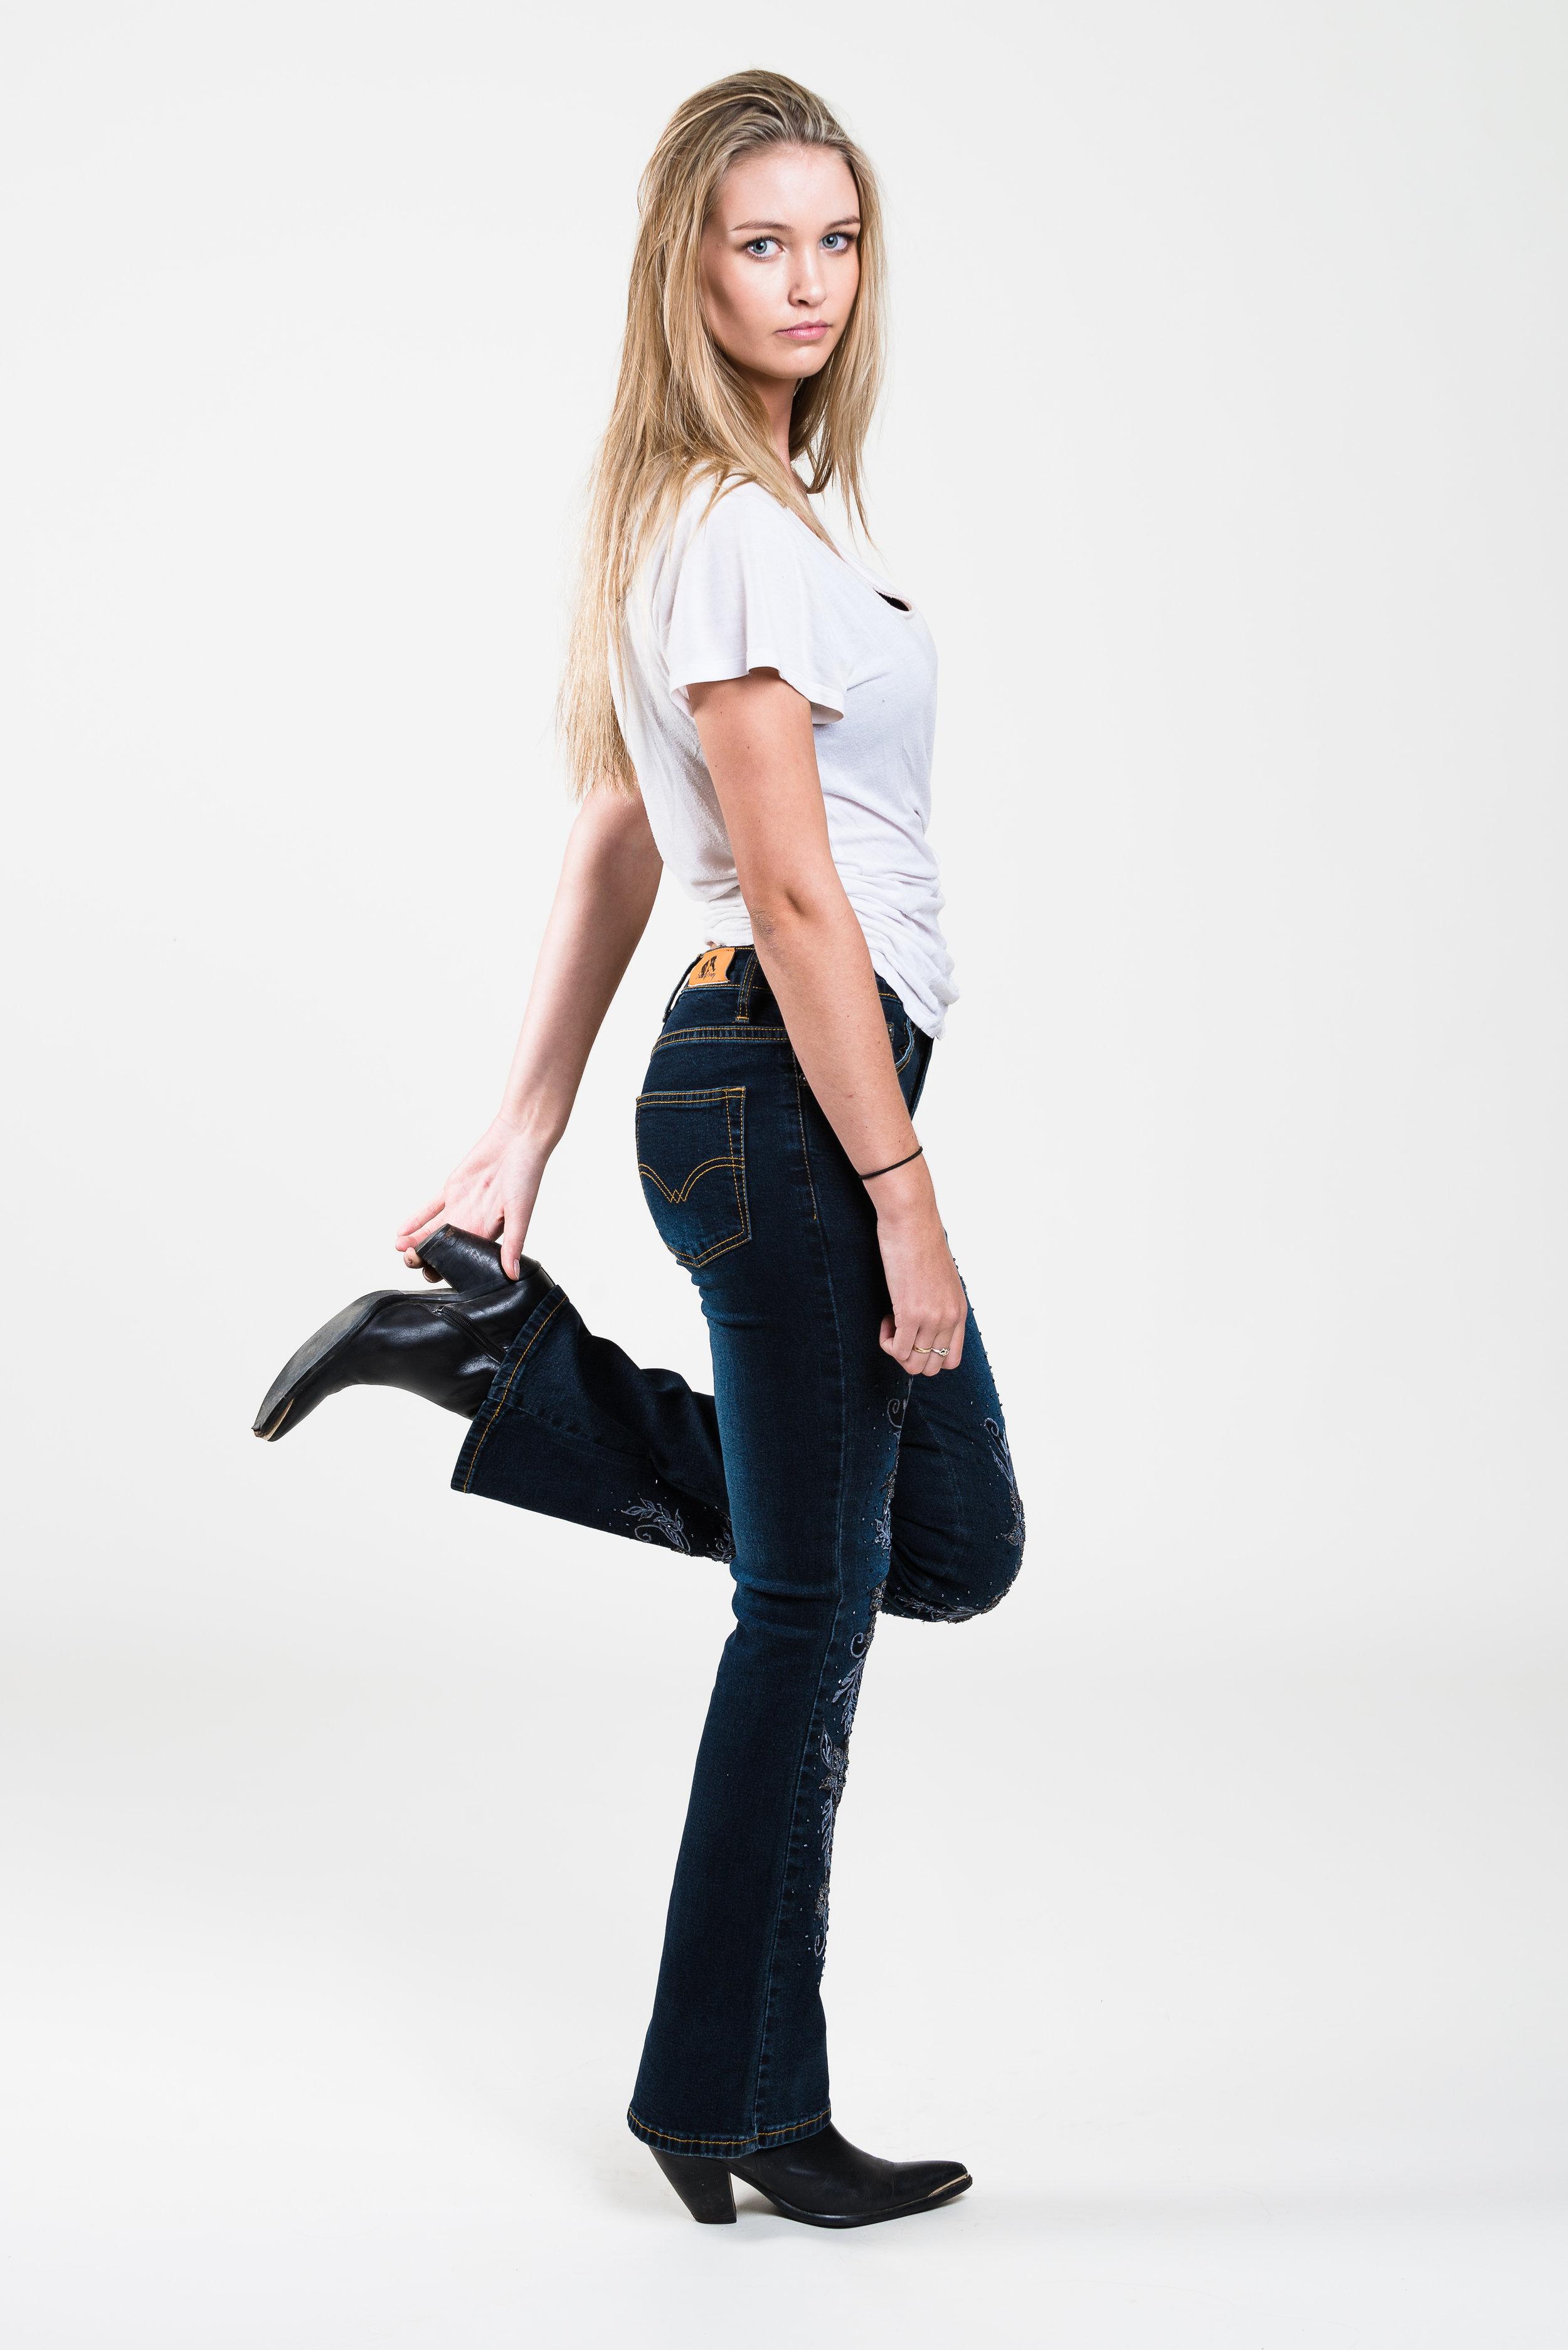 Gabi Jeans #1-38.jpg